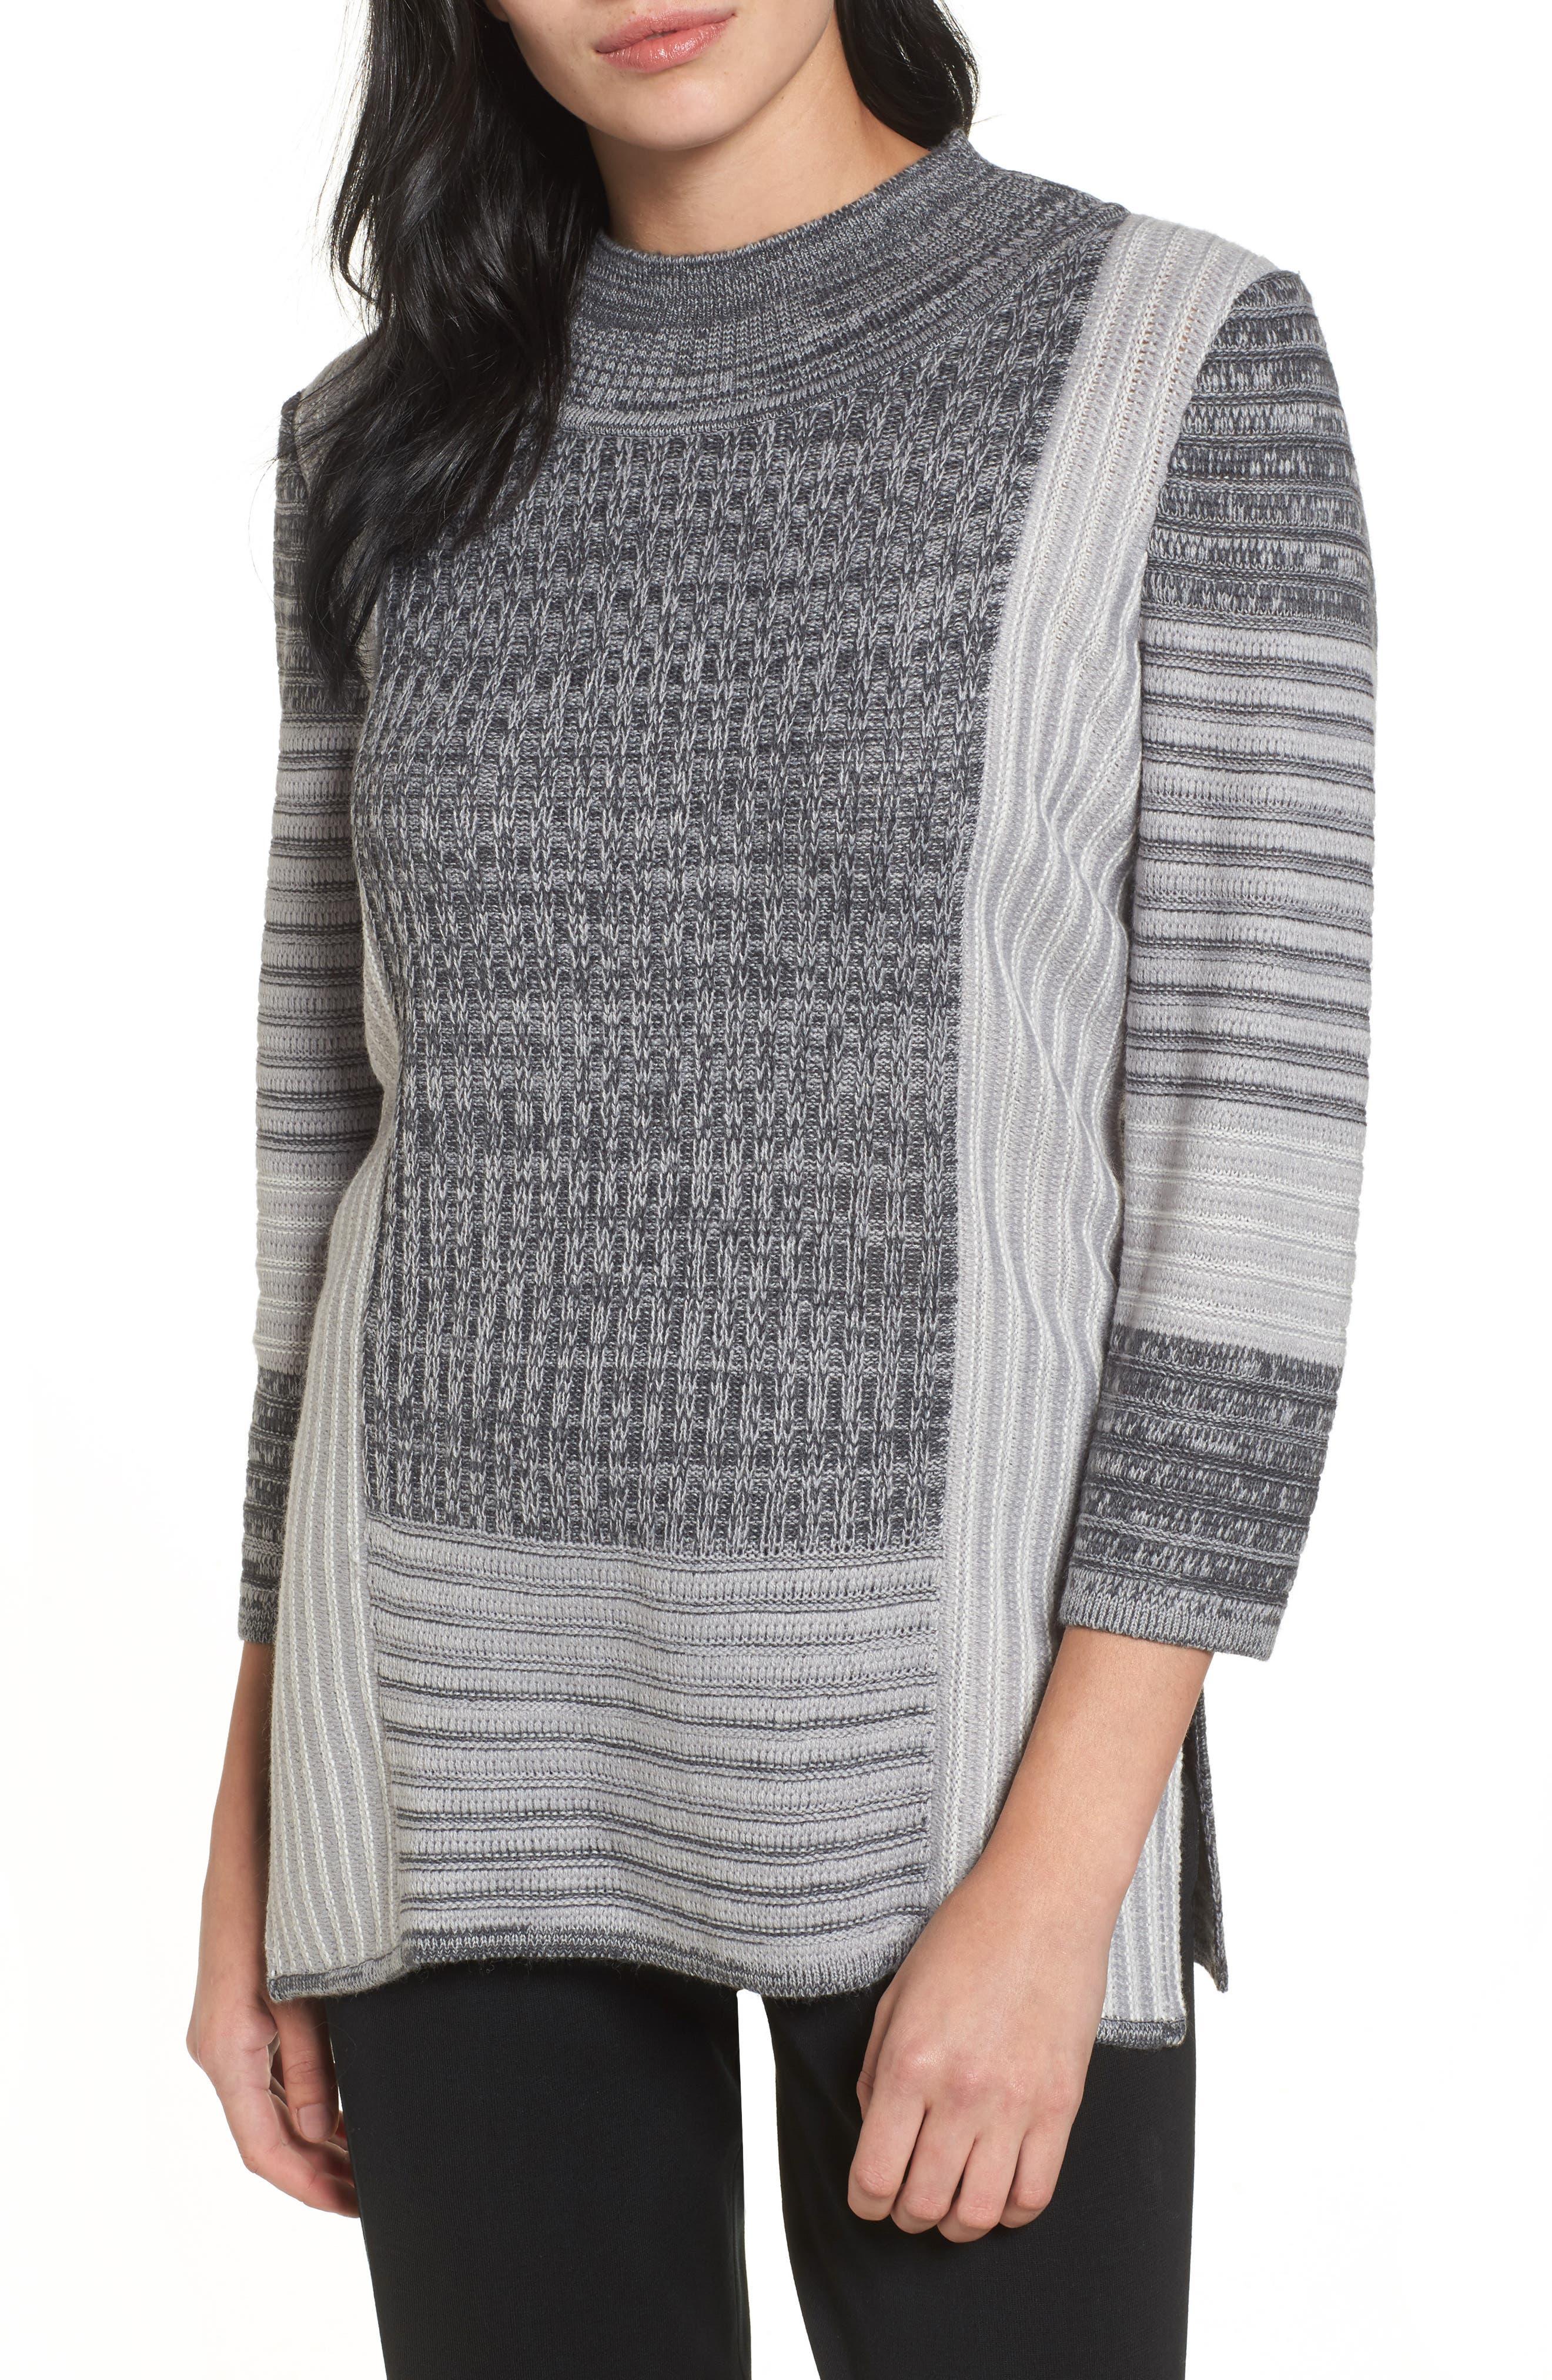 Alternate Image 1 Selected - Ming Wang Mixed Knit Tunic Sweater